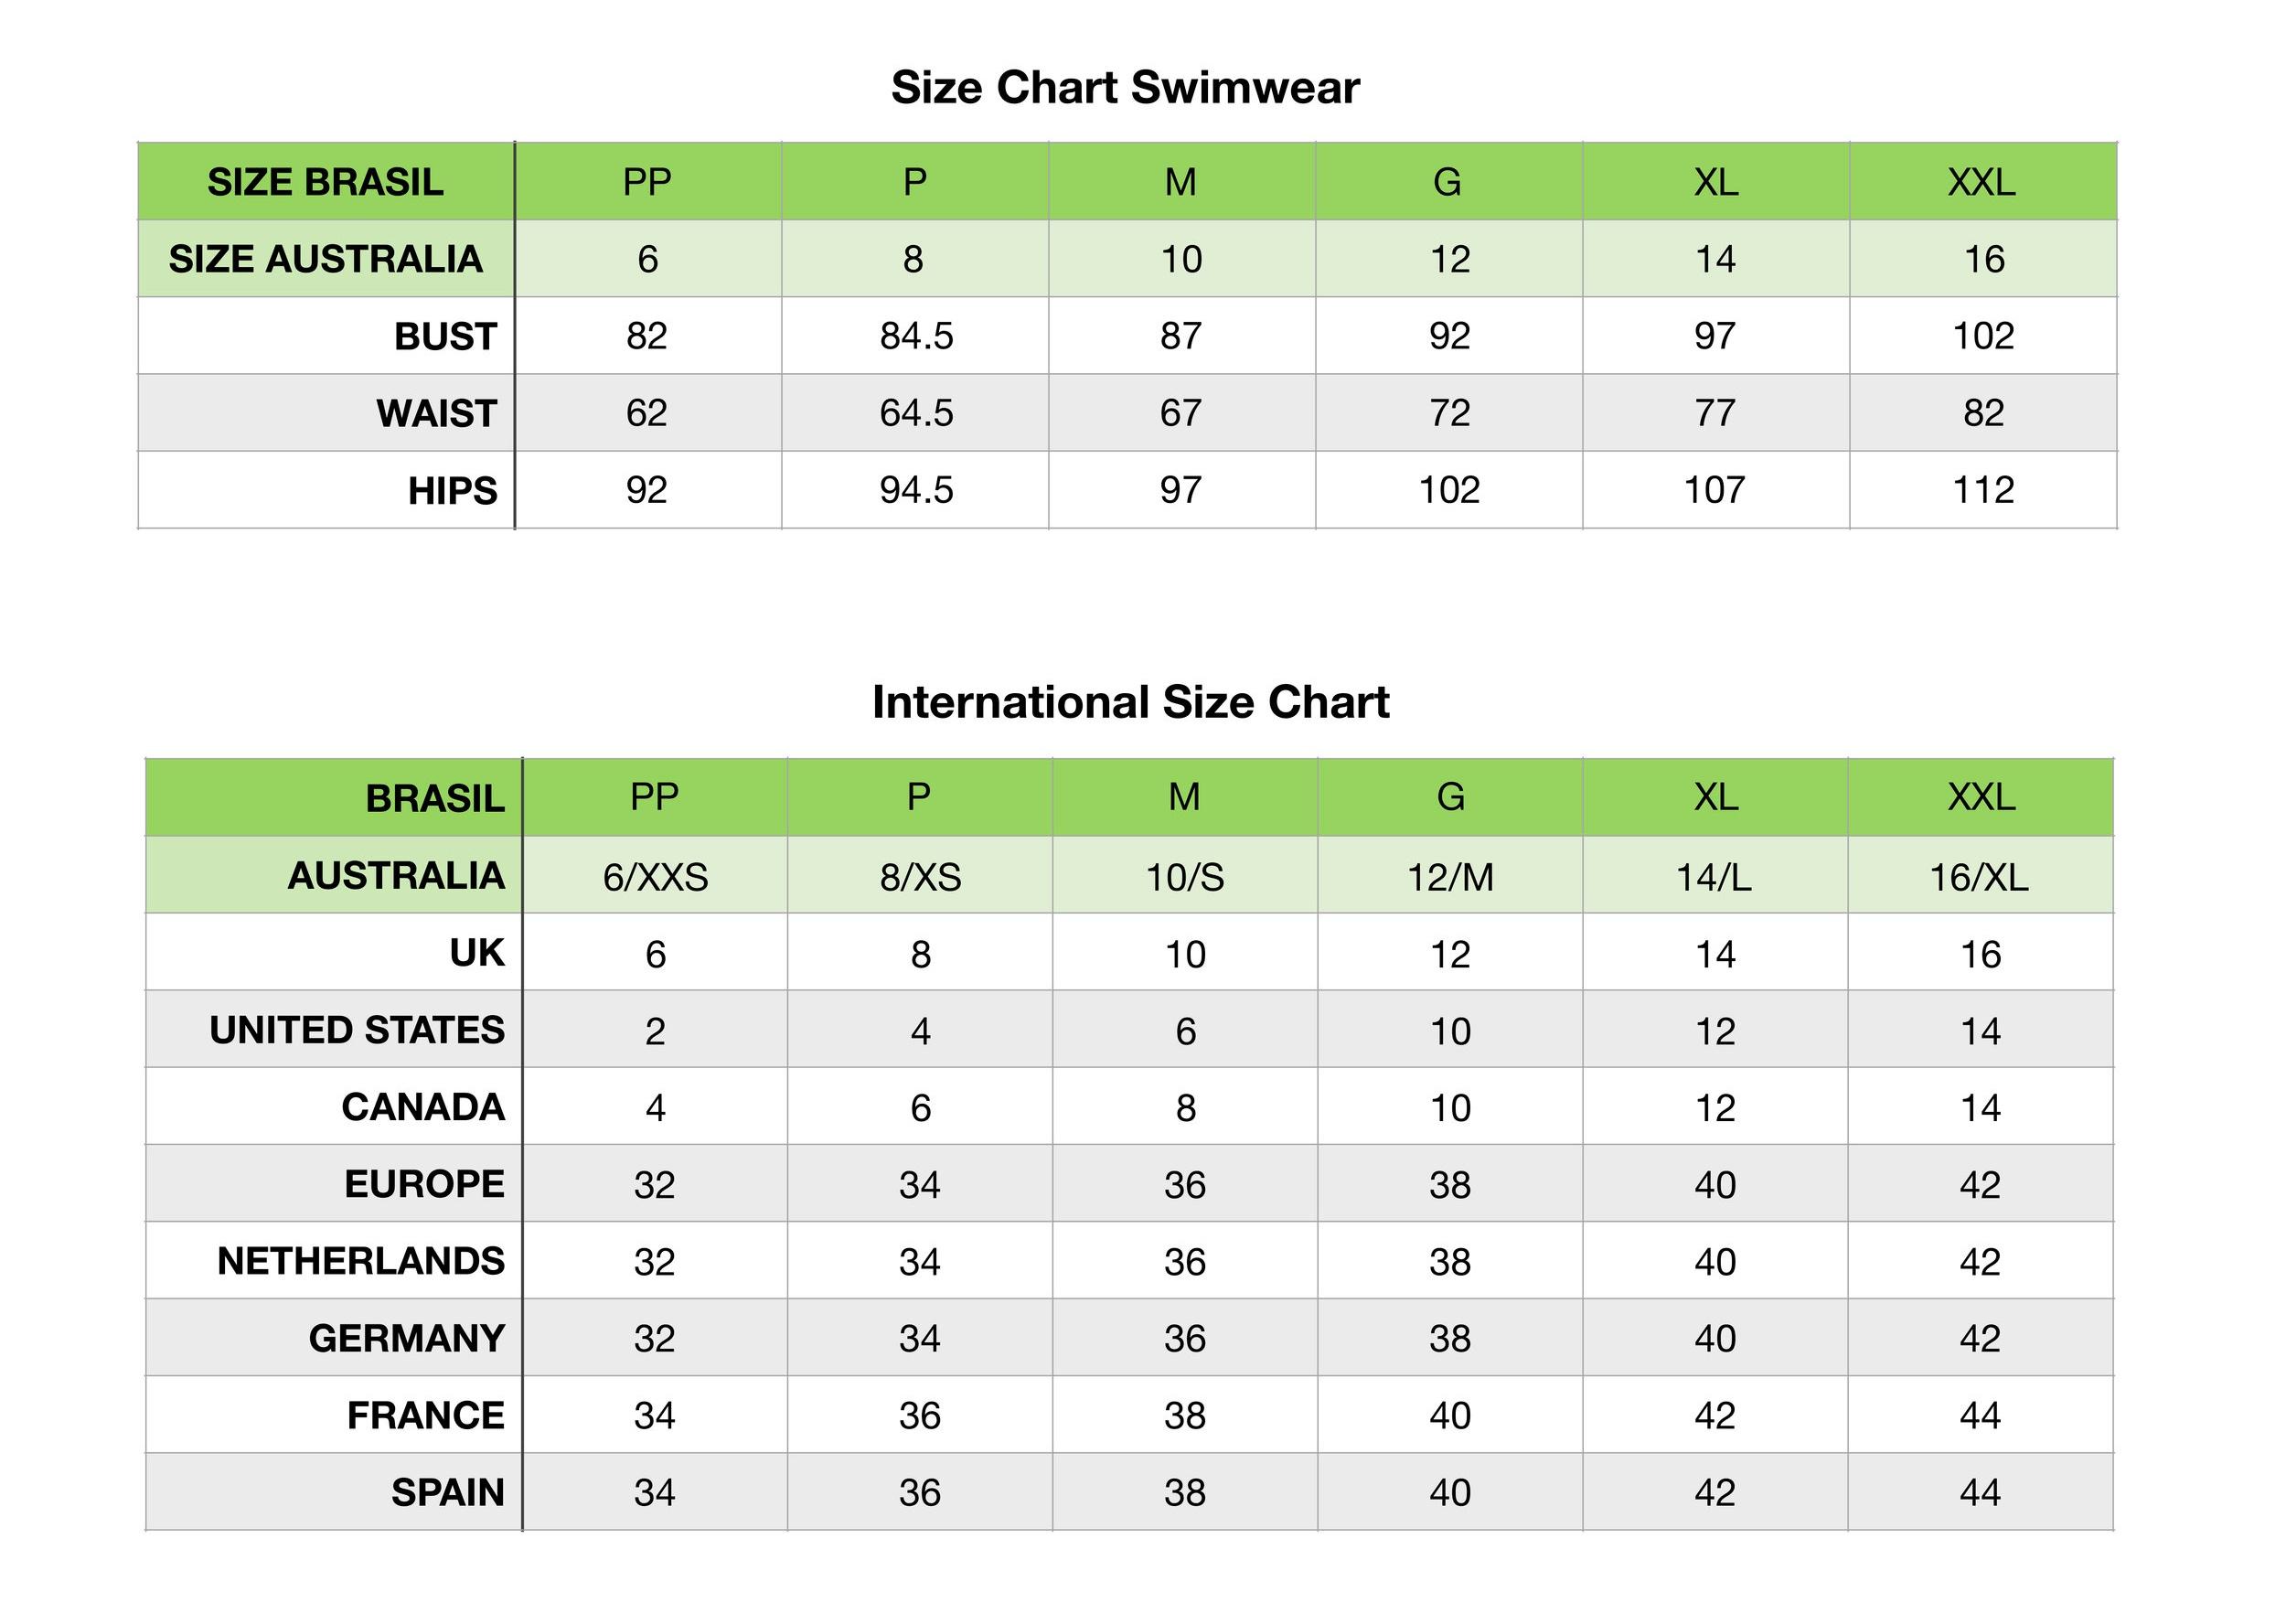 Size+chart+swimwear+USE.jpg